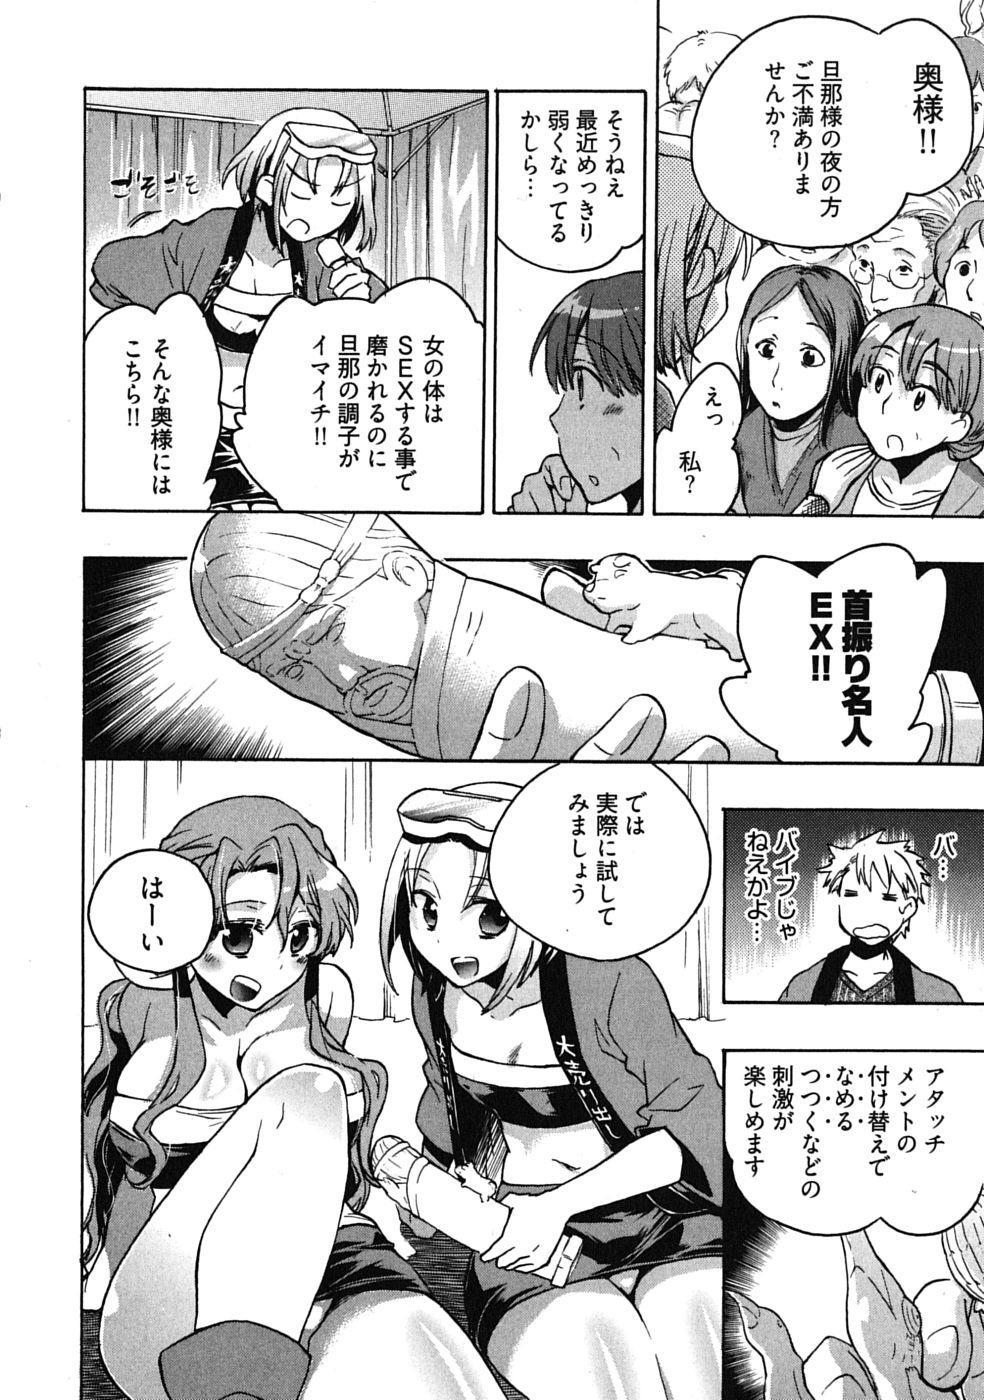 Omocha No Ohime-sama | La Princesse De Jouet Vol. 3 53